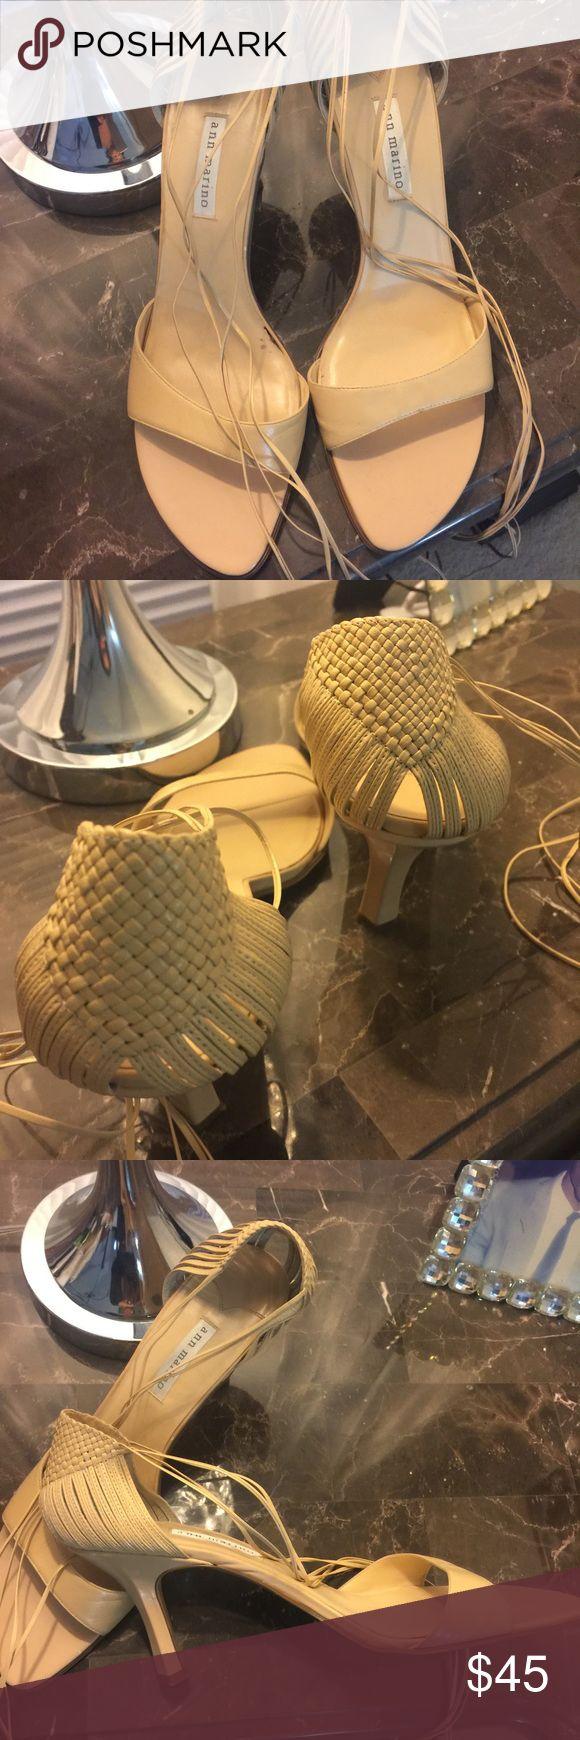 Ann Marino scrappy sandals. Neutral beige Open toe sandals with straps that tie up leg. Ann Marino Shoes Sandals